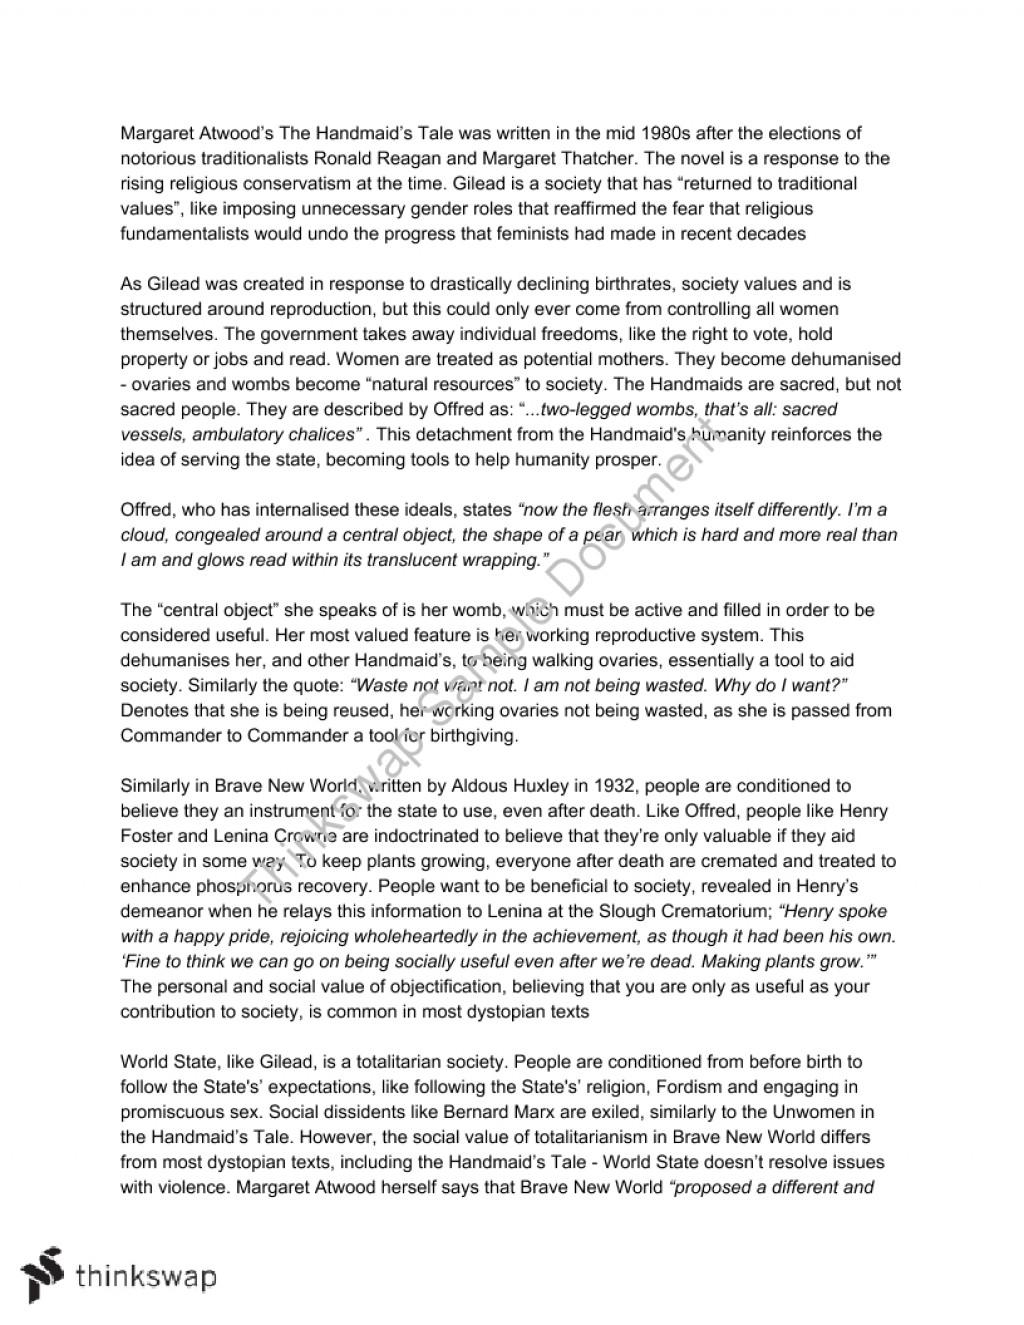 001 Essay Example 53179 Extensionassignment21 The Handmaids Astounding Tale Handmaid's Topics Paper Large